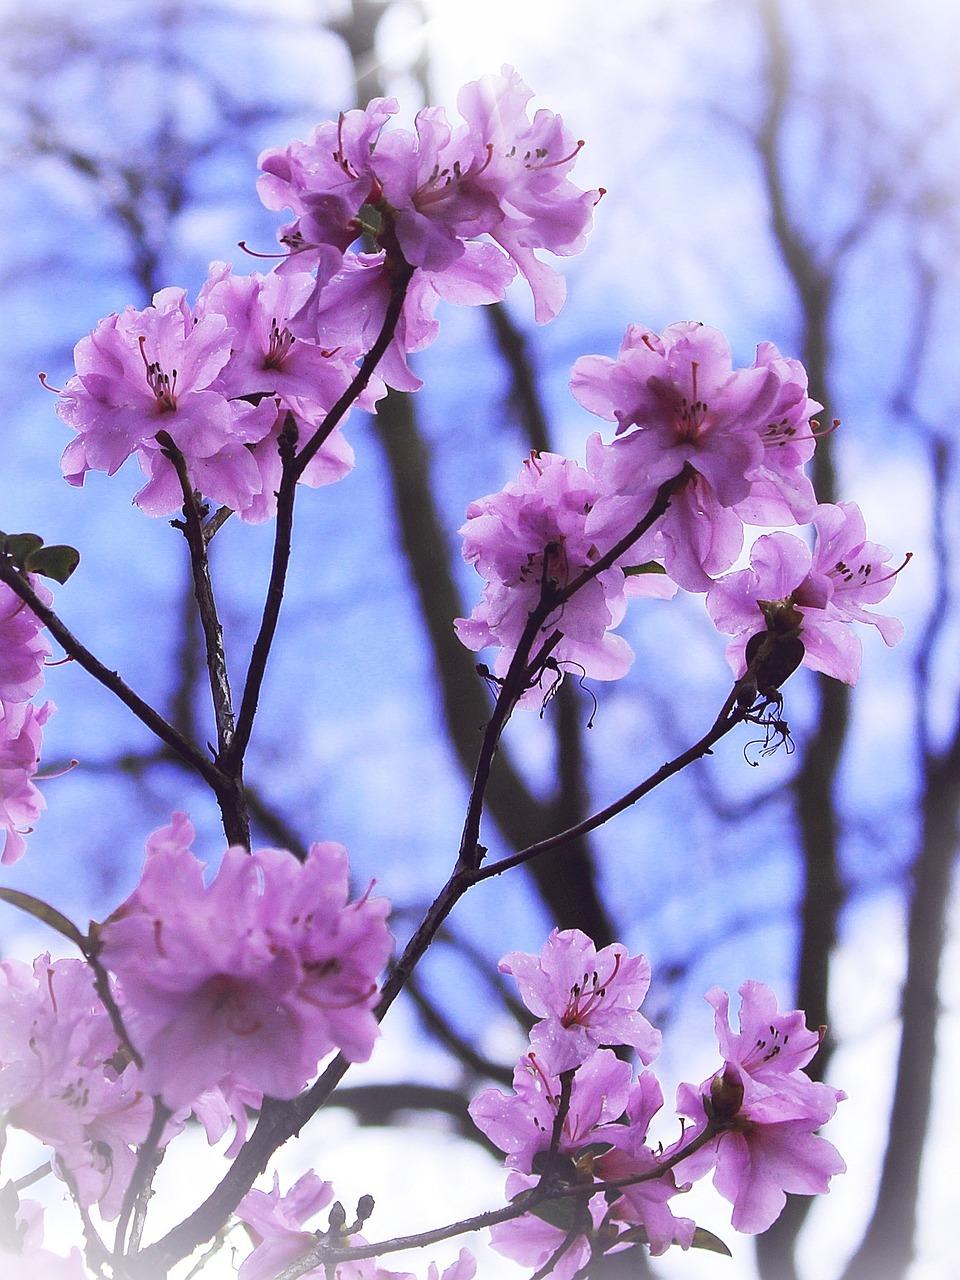 Flowersbushspringpinkblue Free Photo From Needpix